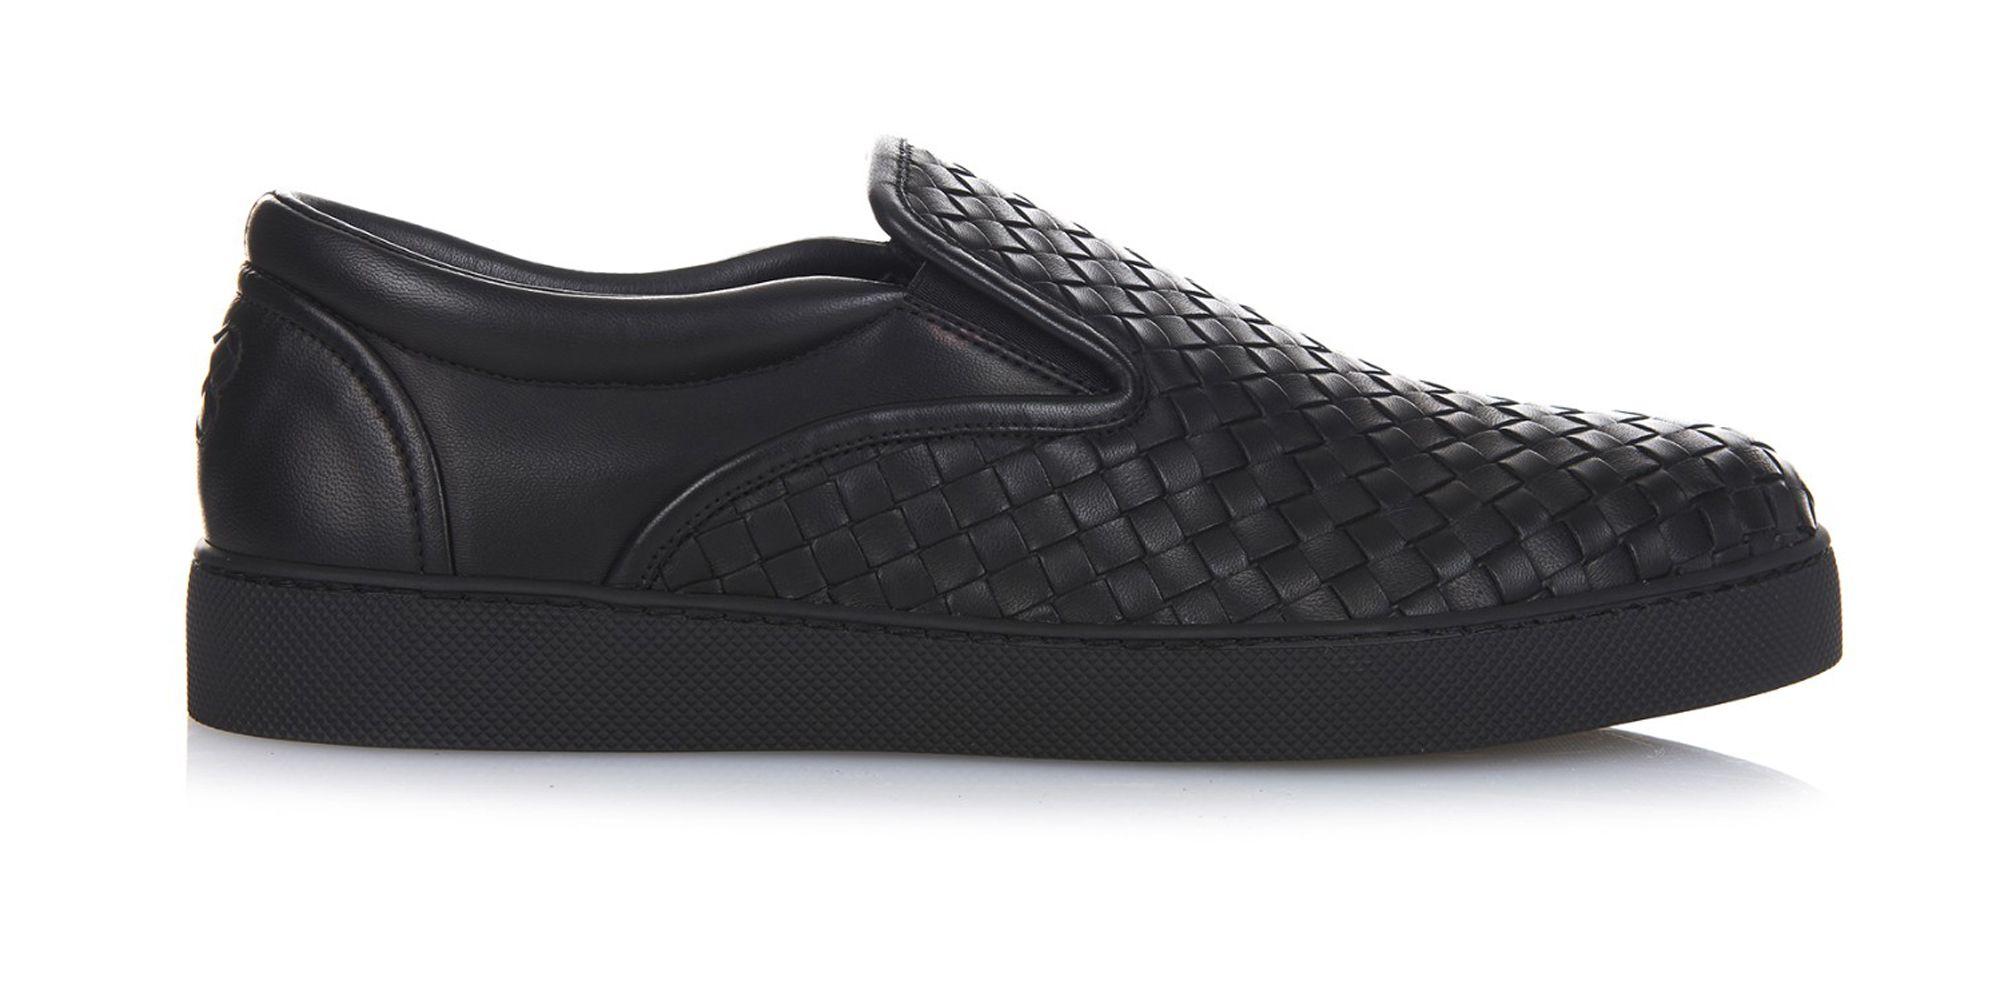 cea16bc75 The Footwear Fix: Bottega Veneta Intrecciato Sneakers